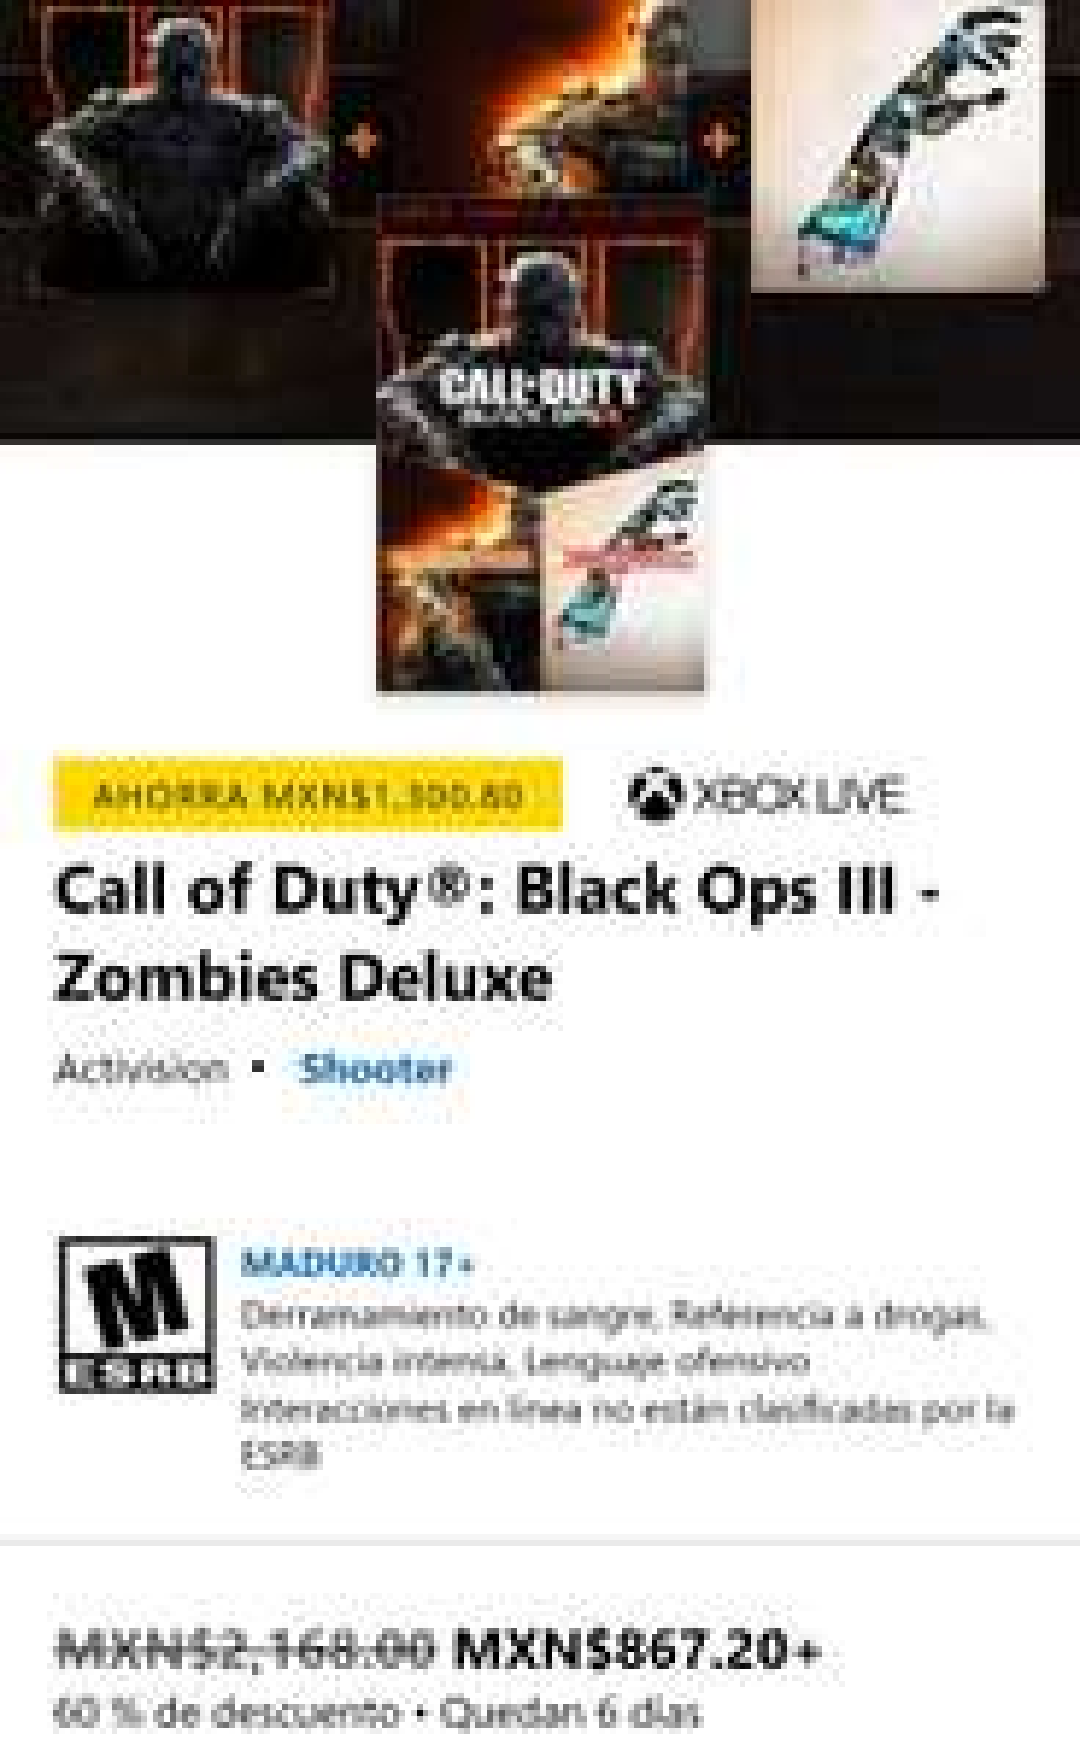 Microsoft Store: CoD Black Ops III - Zombies Deluxe (Xbox)